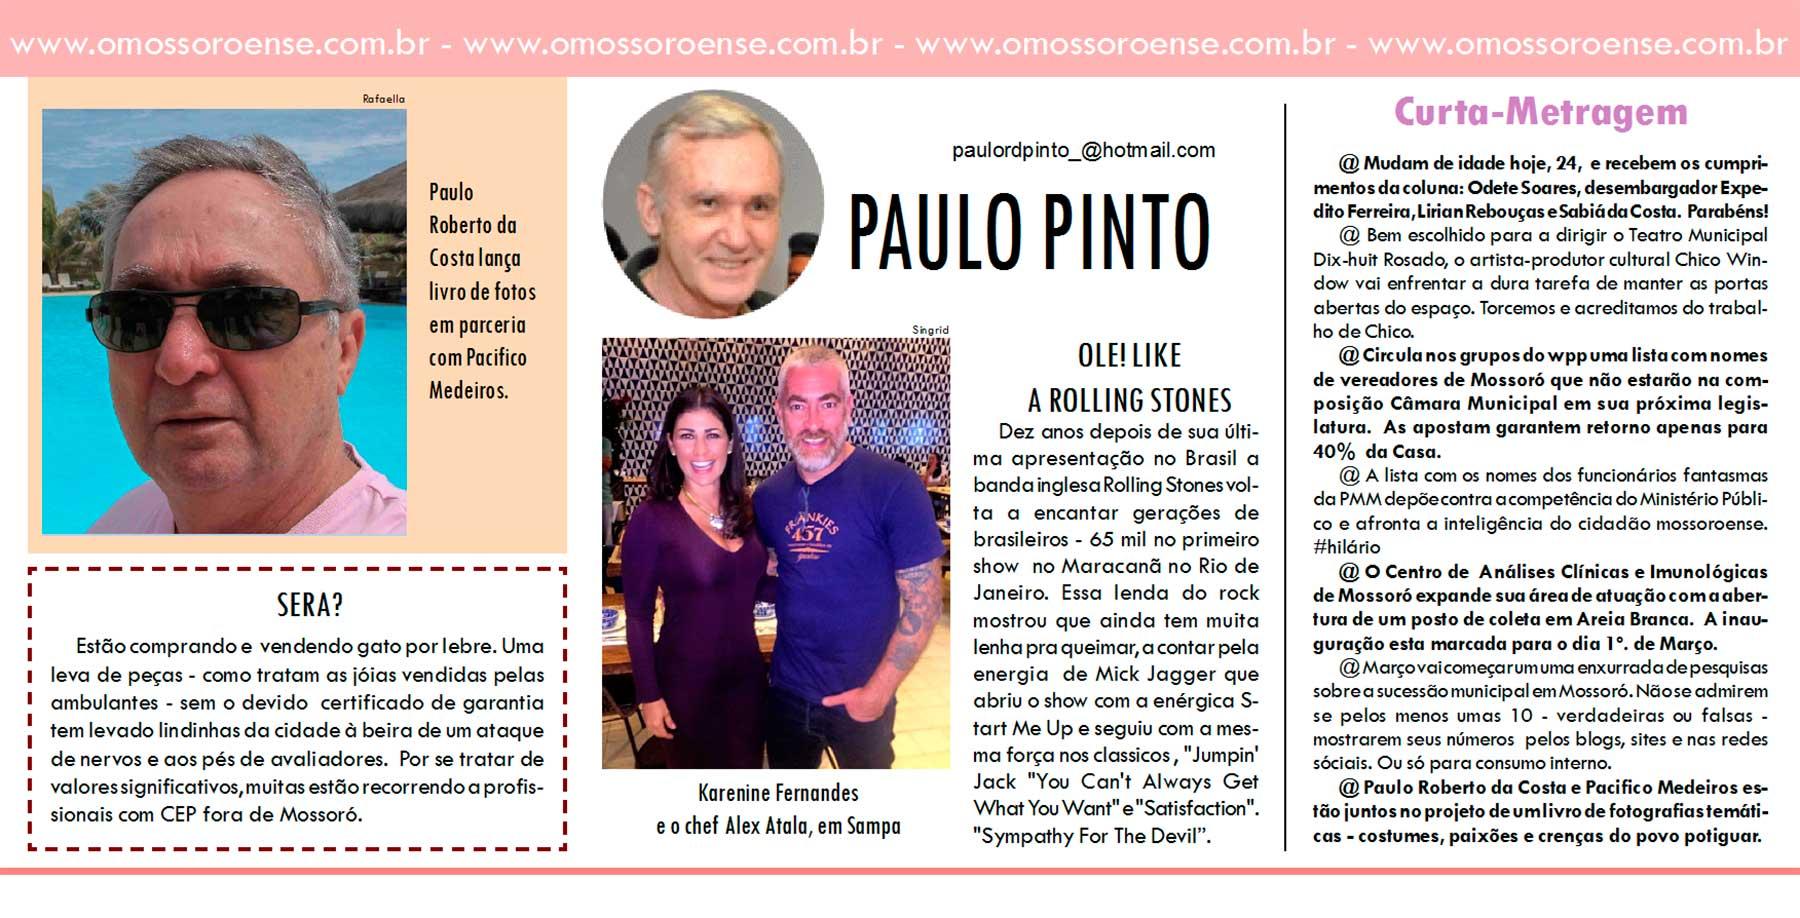 PAULO-PINTO-PC-24-02-16